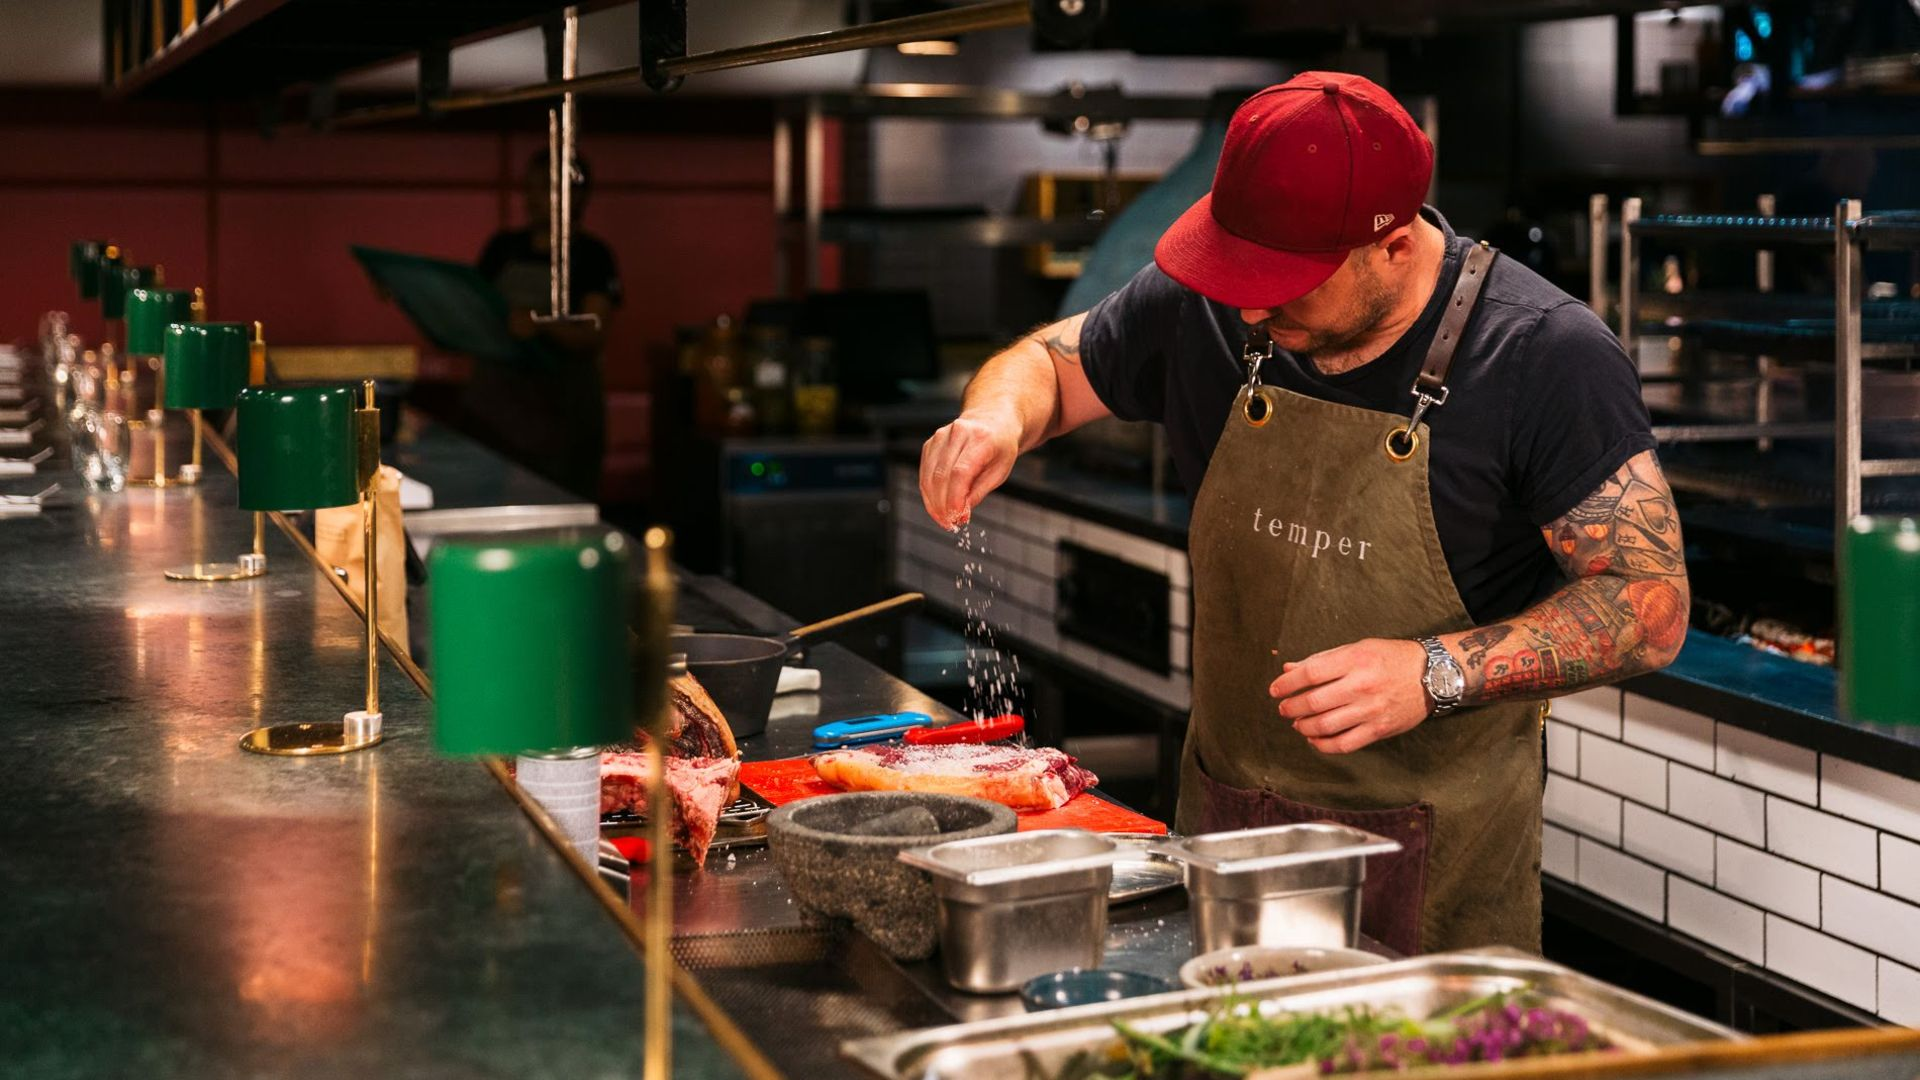 Ford Ranger Raptor chef foraging